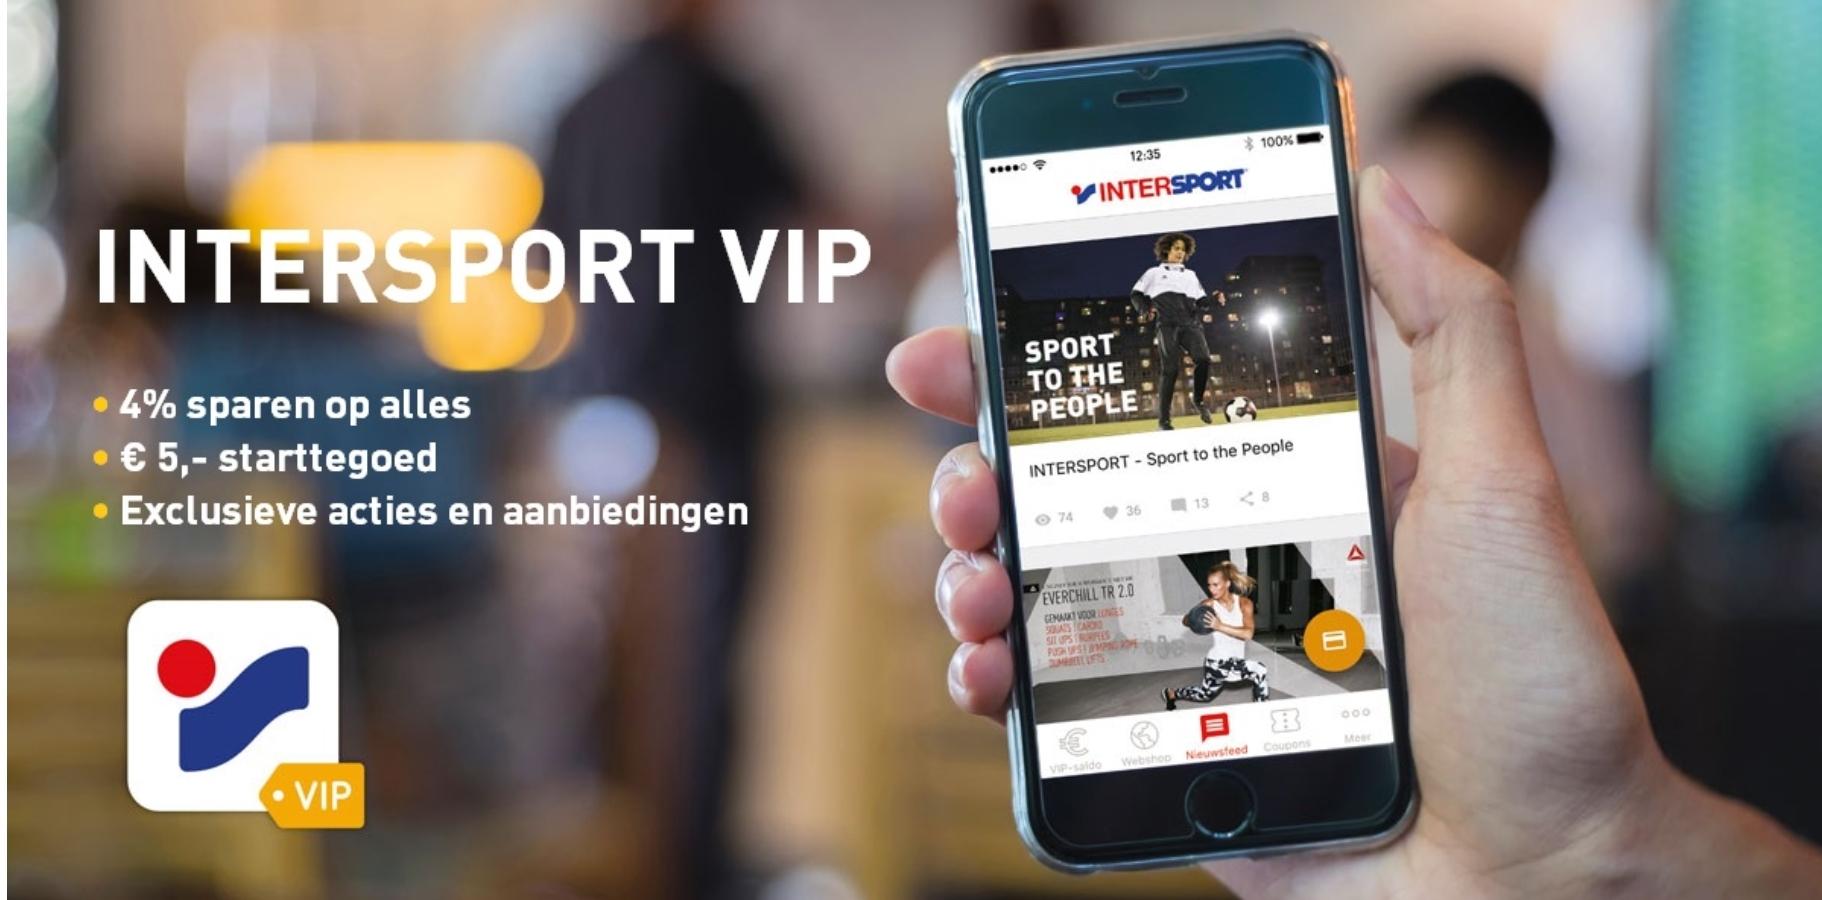 Gratis € 5,- starttegoed zonder minimale besteding @ INTERSPORT VIP-app